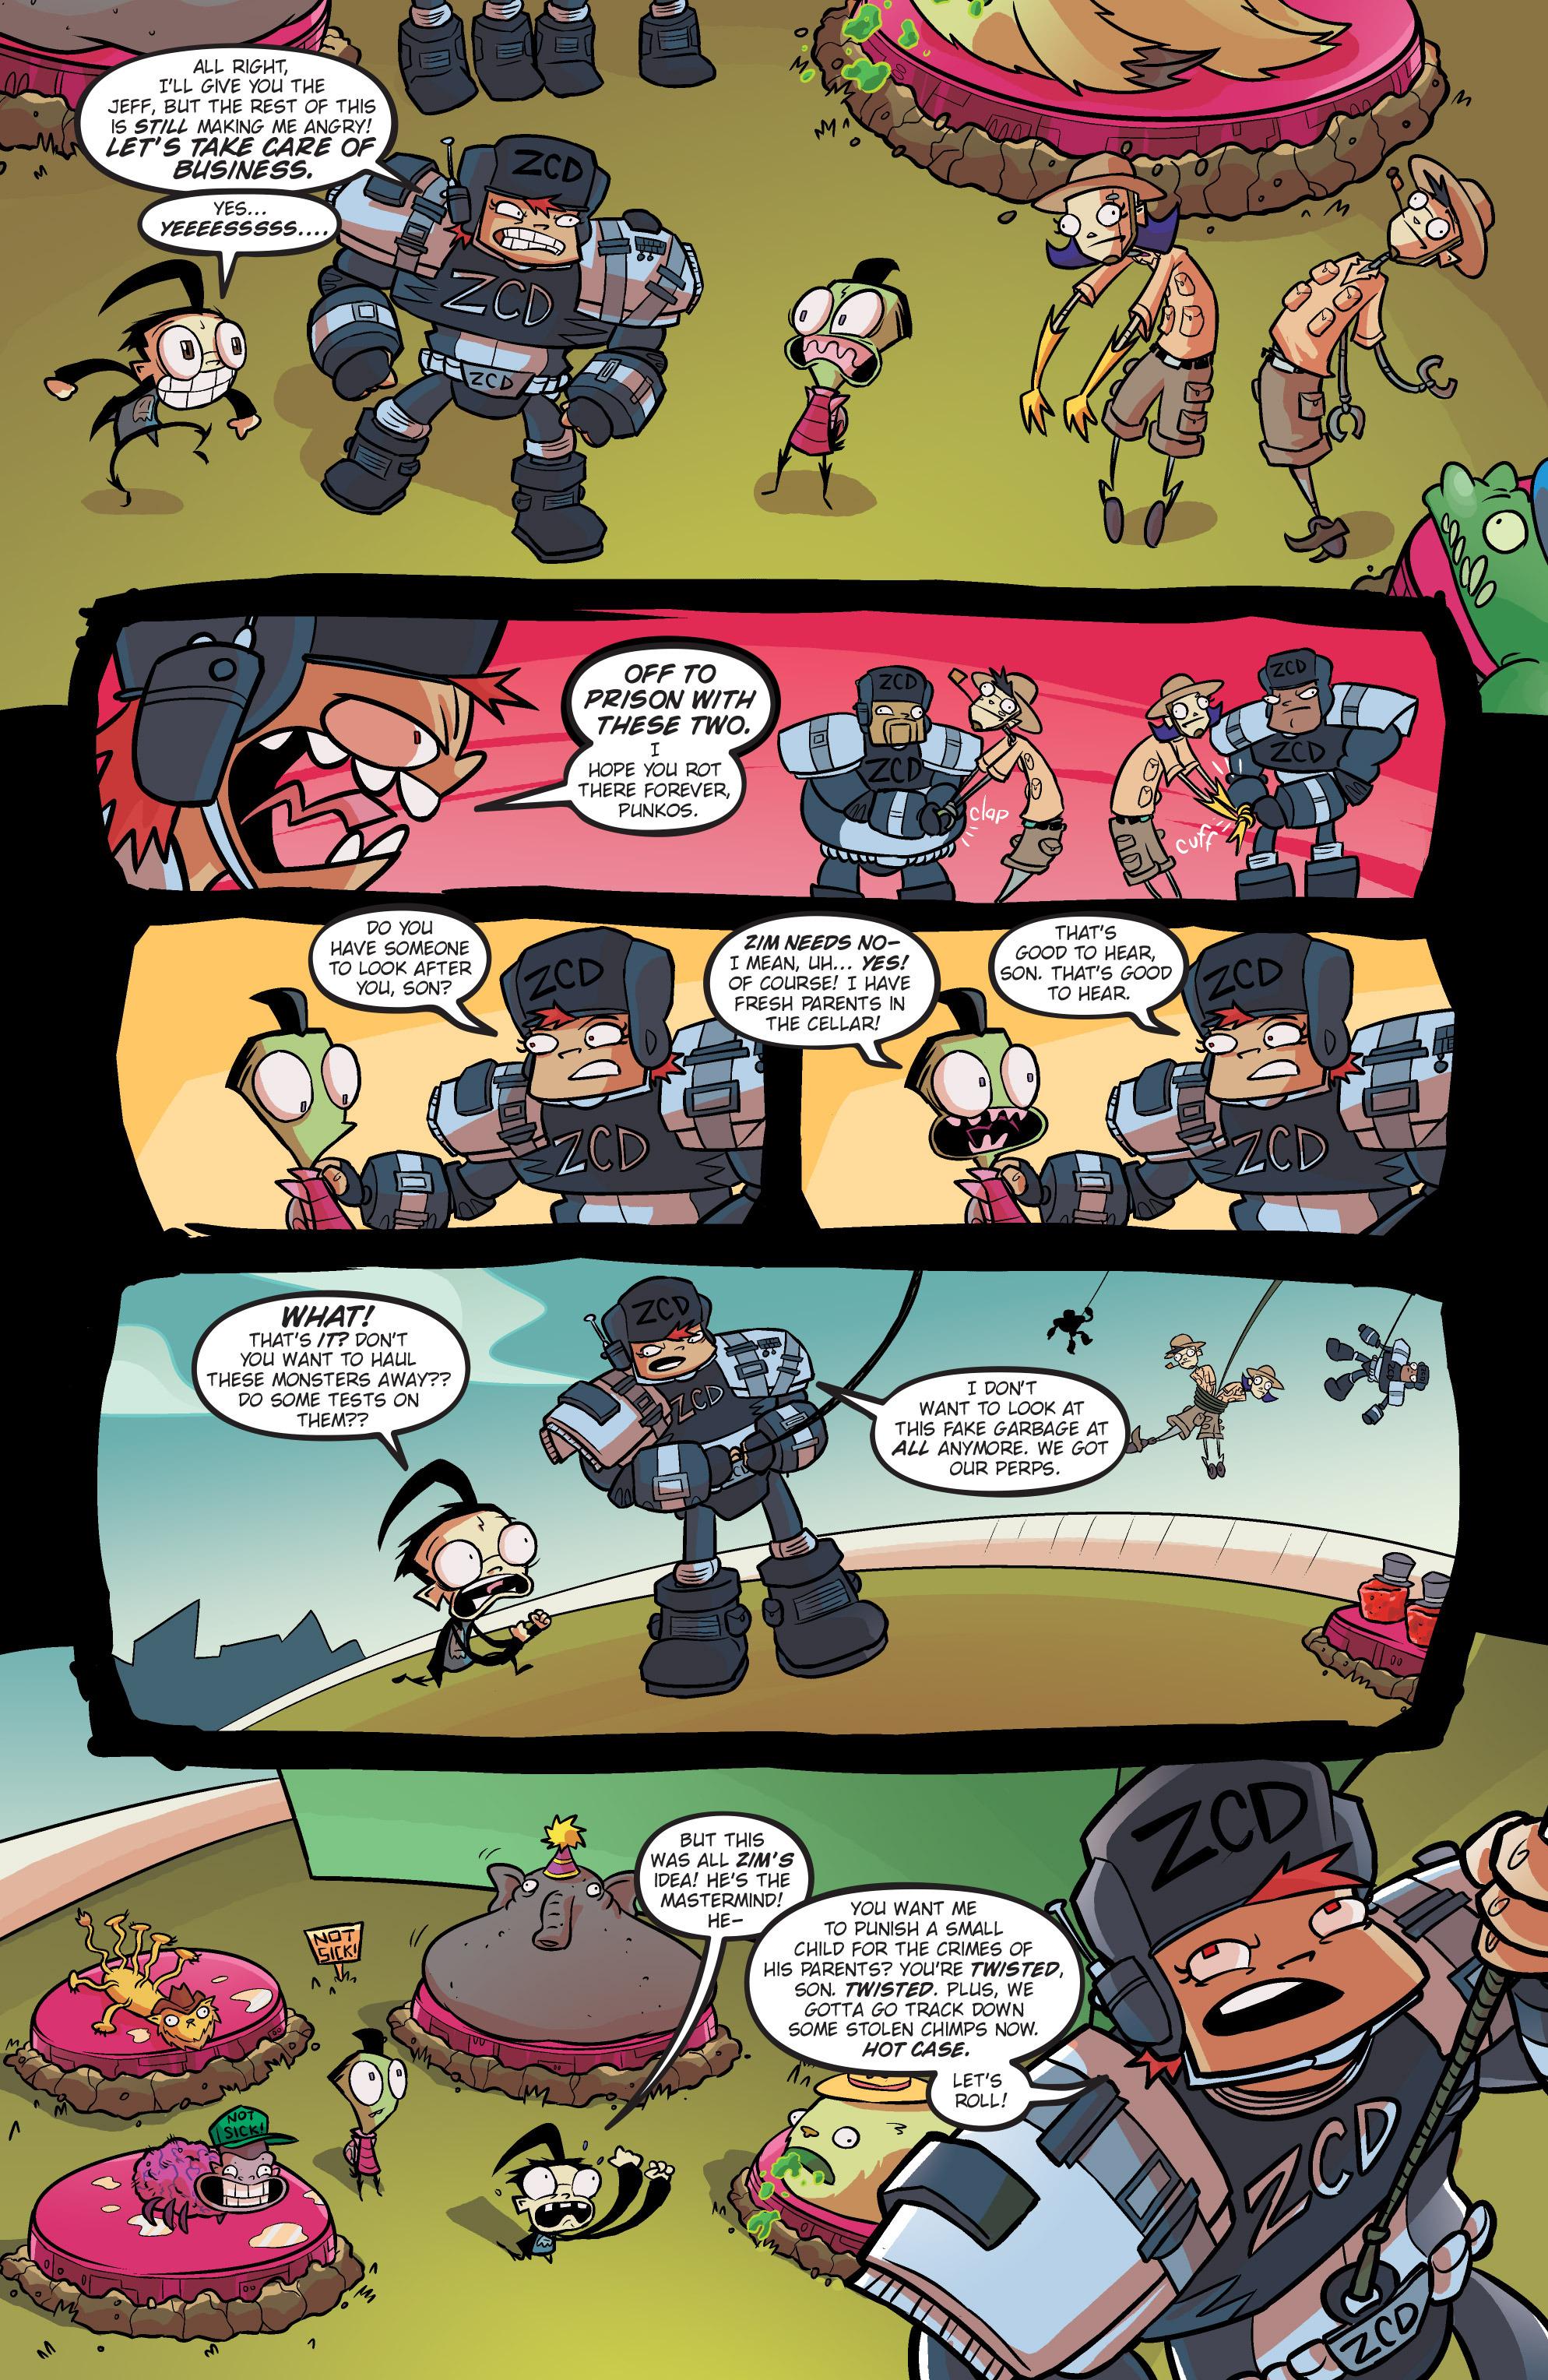 Read online Invader Zim comic -  Issue #19 - 22